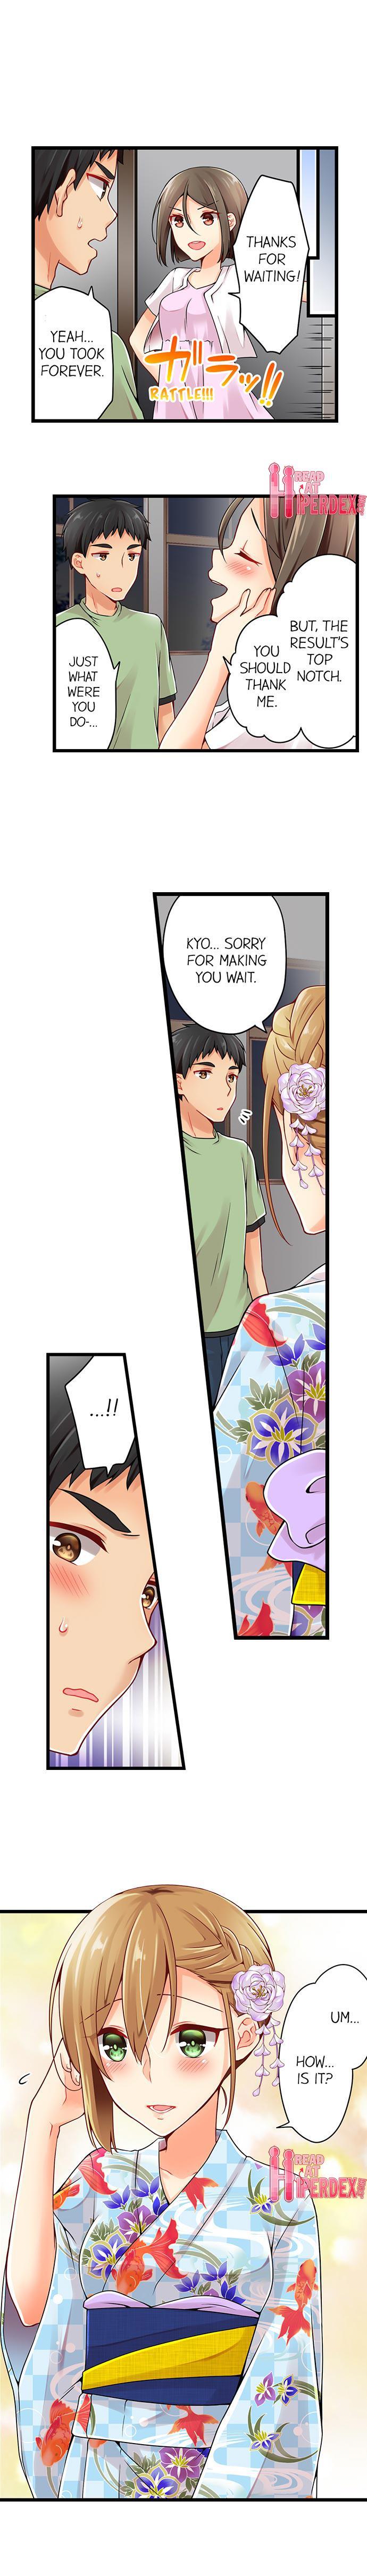 Ren Arisugawa Is Actually A Girl 774